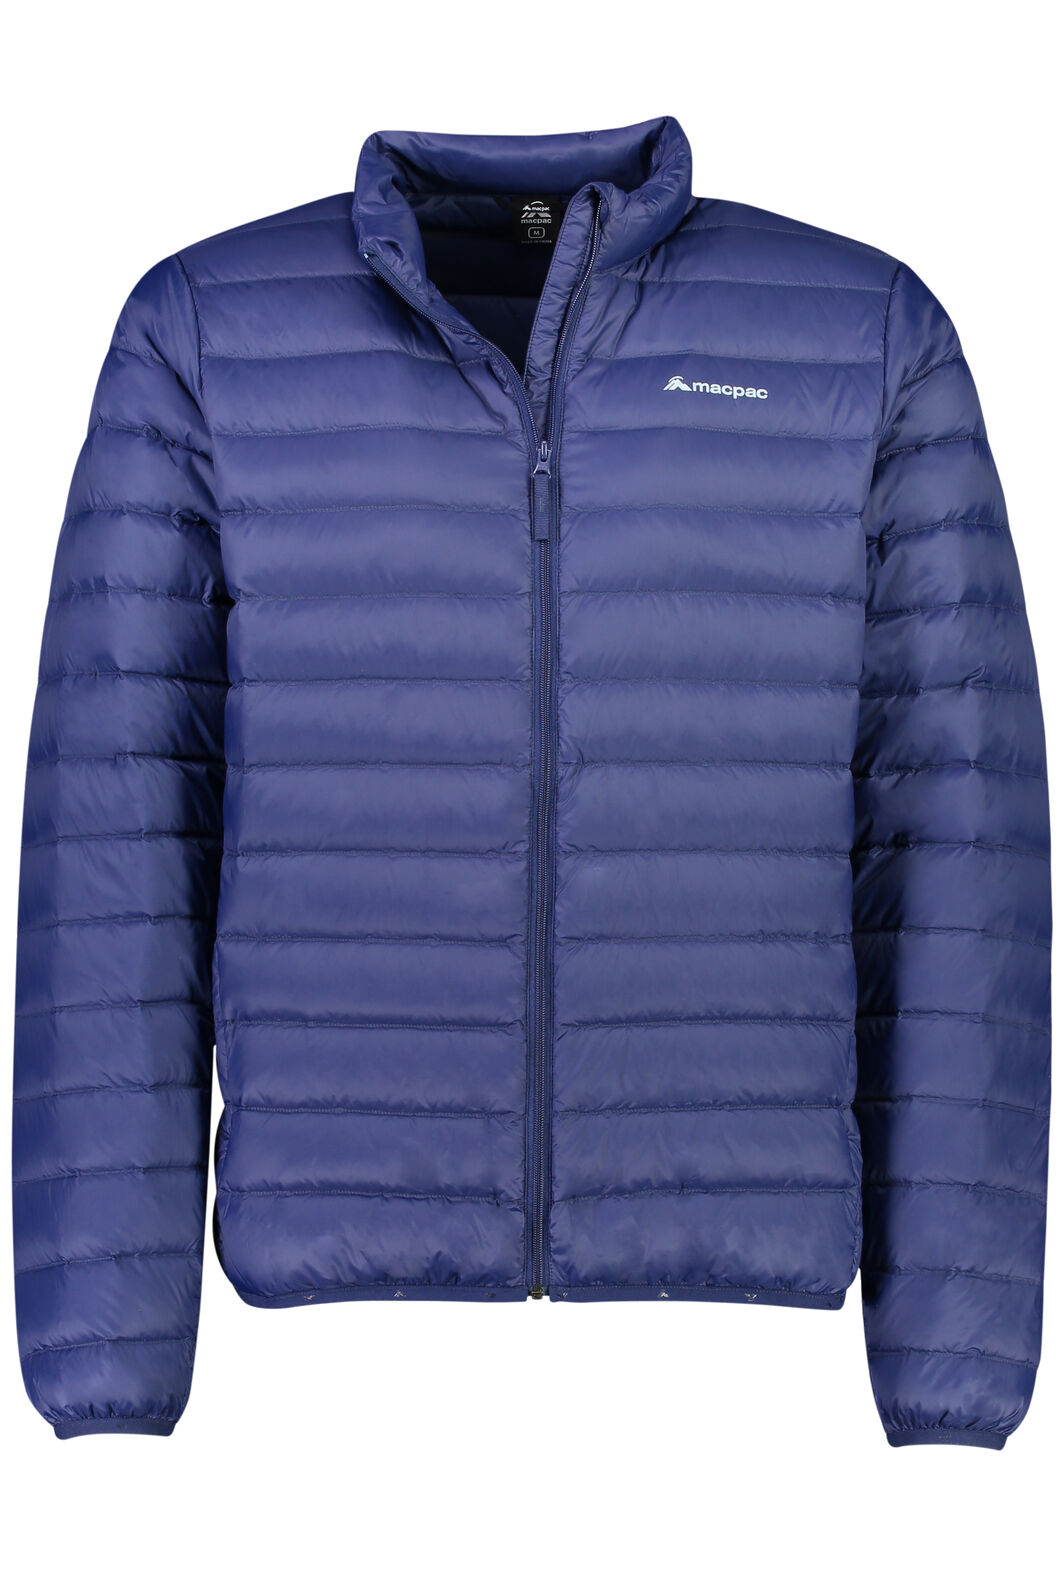 Macpac Uber Light Down Jacket - Men's, Medieval Blue, hi-res